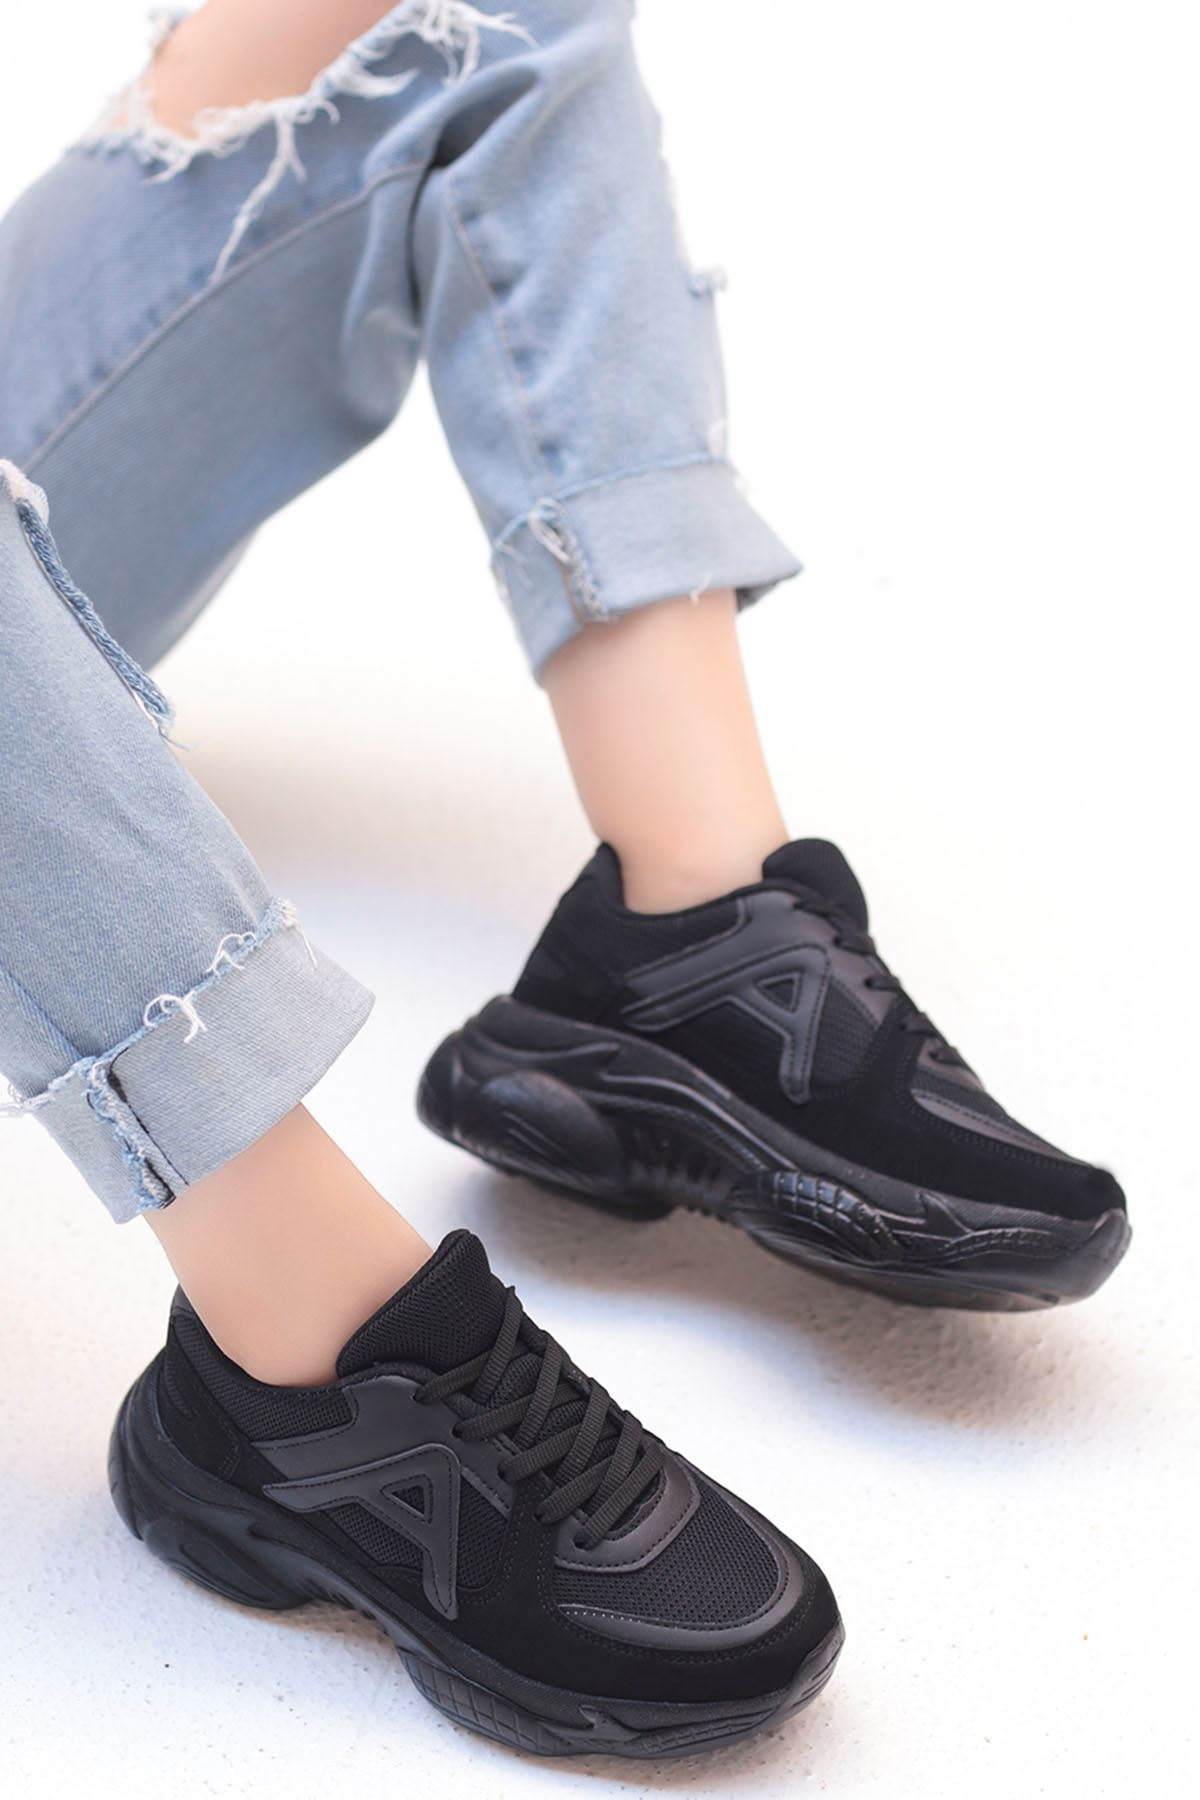 Afra A Detay Spor Ayakkabı Ful Siyah